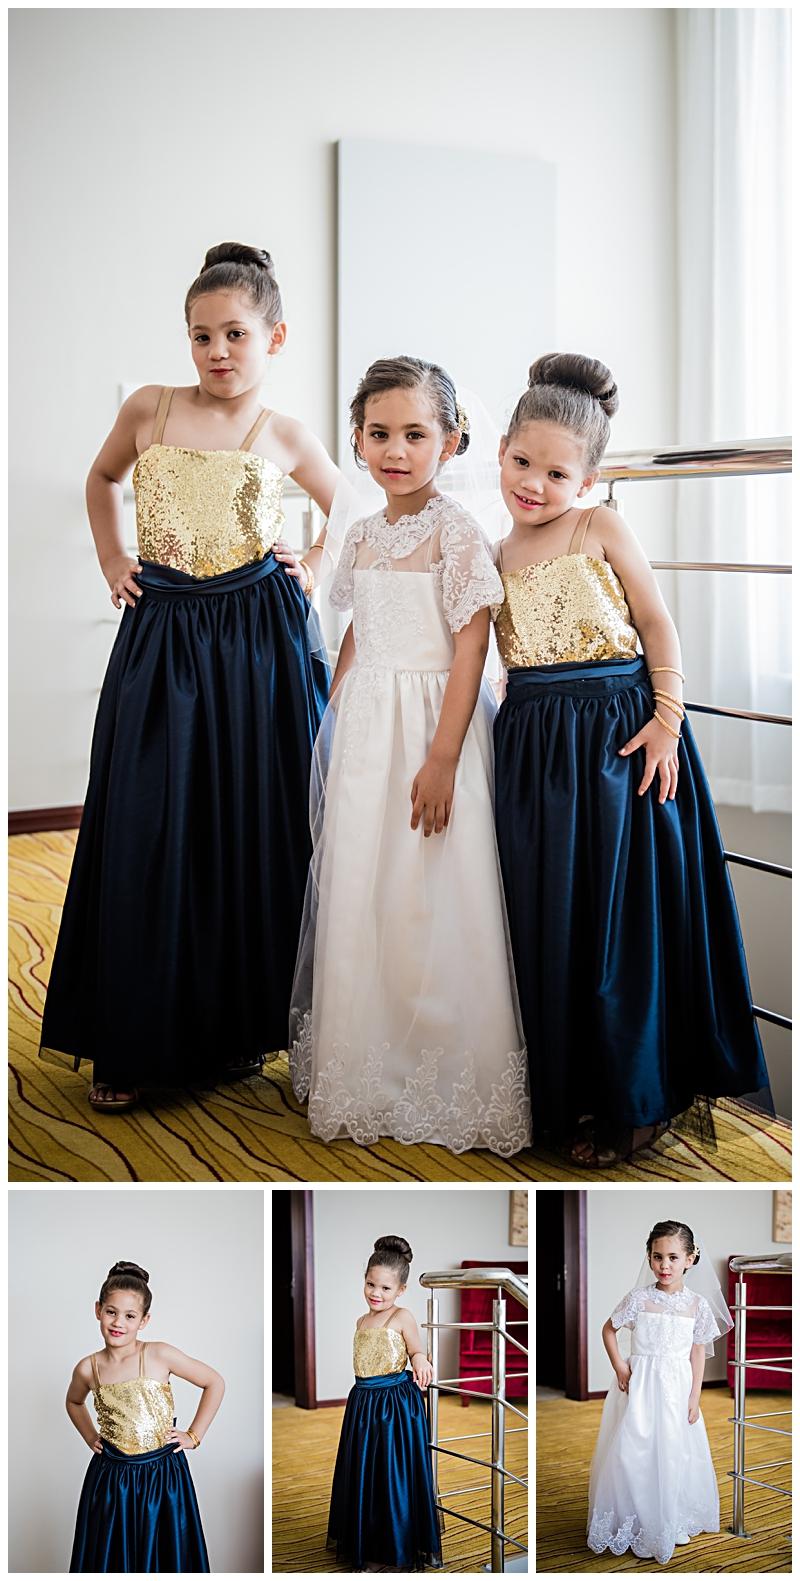 Best wedding photographer - AlexanderSmith_1402.jpg